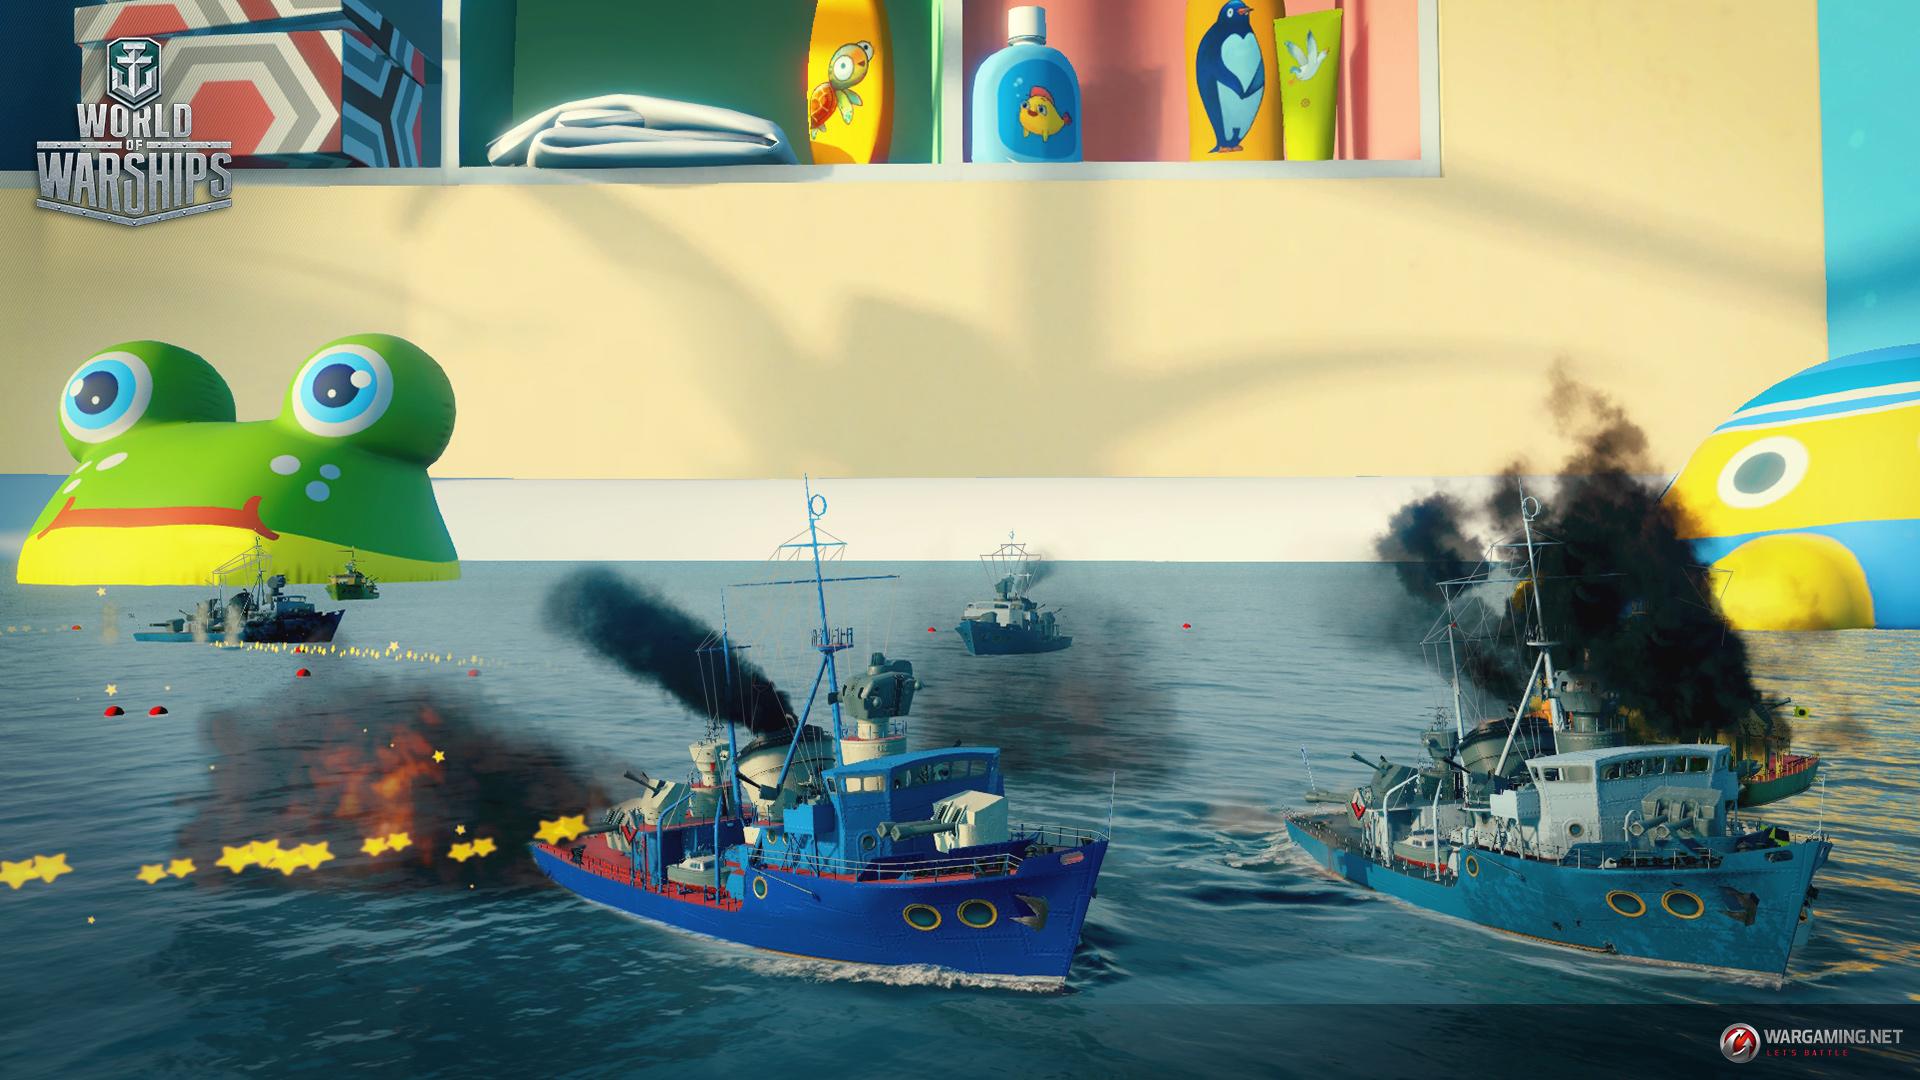 It S Tub Time World Of Warships. World Of Warships Bathtub Battles. Bathtub  Battles Canlisohbethattiniz